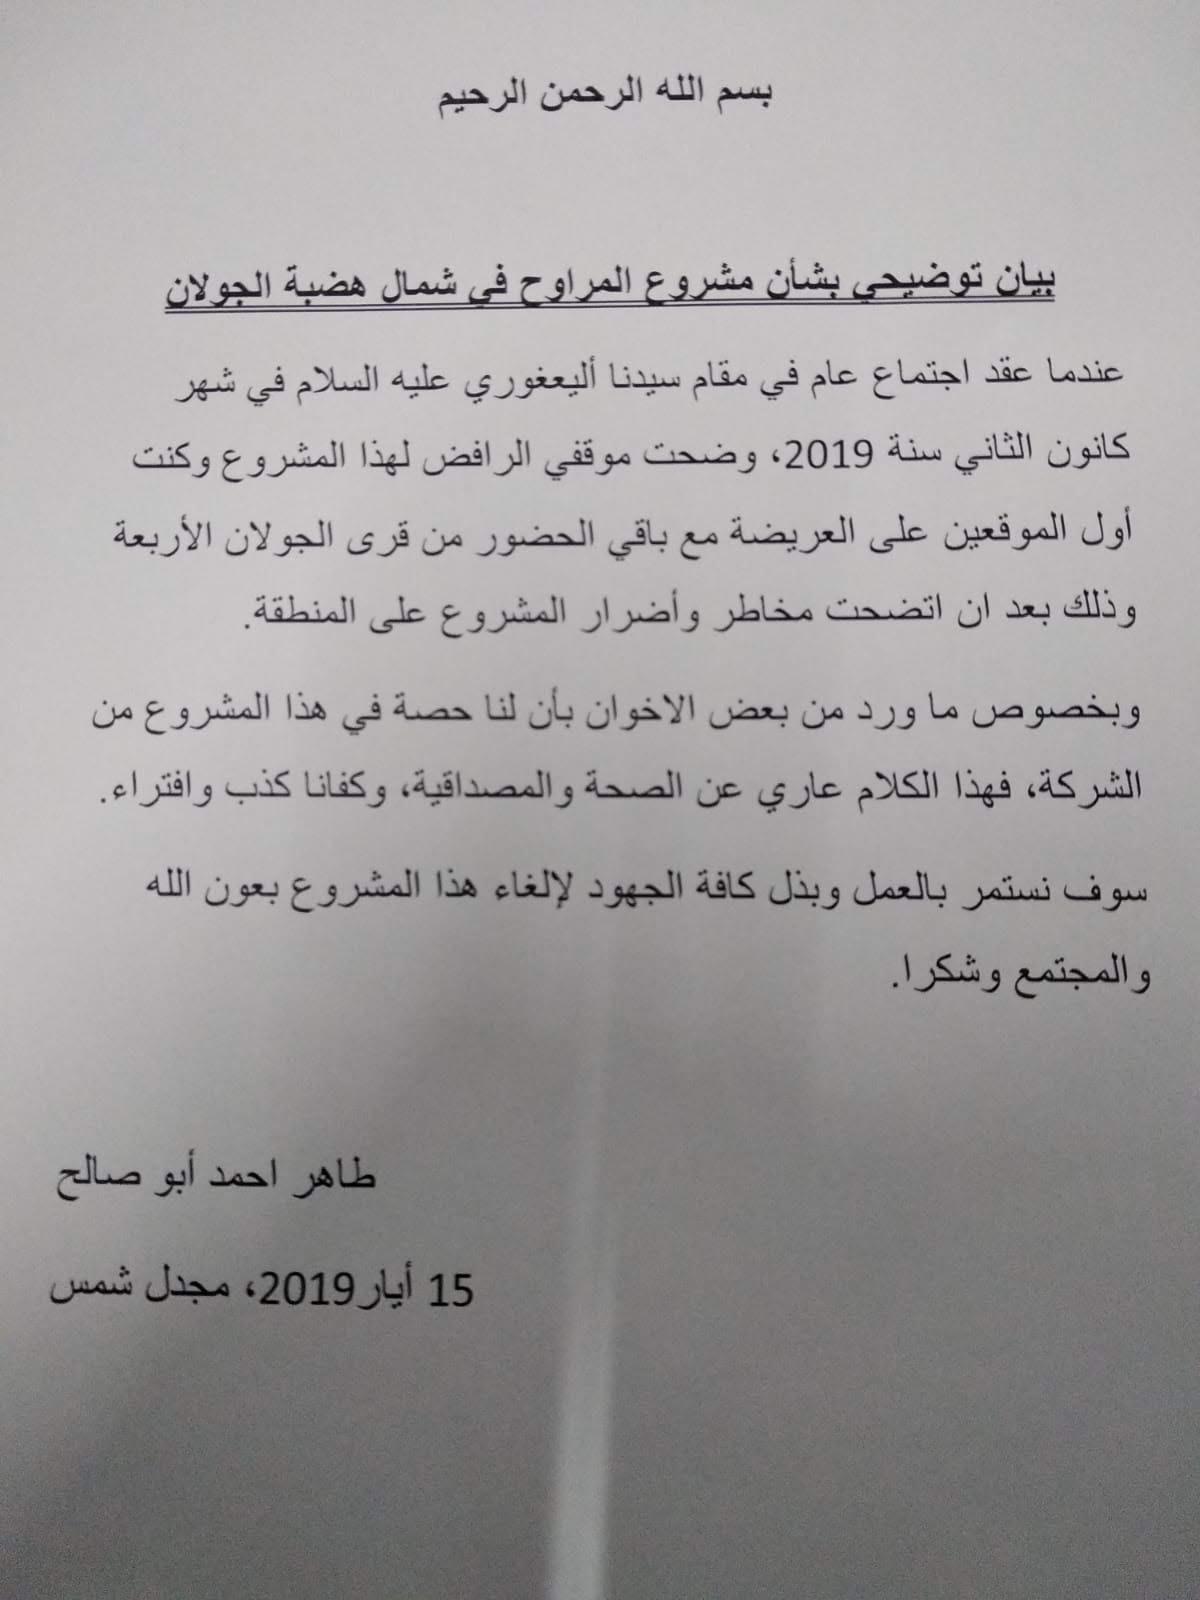 Photo of بيان توضيحي من الشيخ طاهر ابو صالح